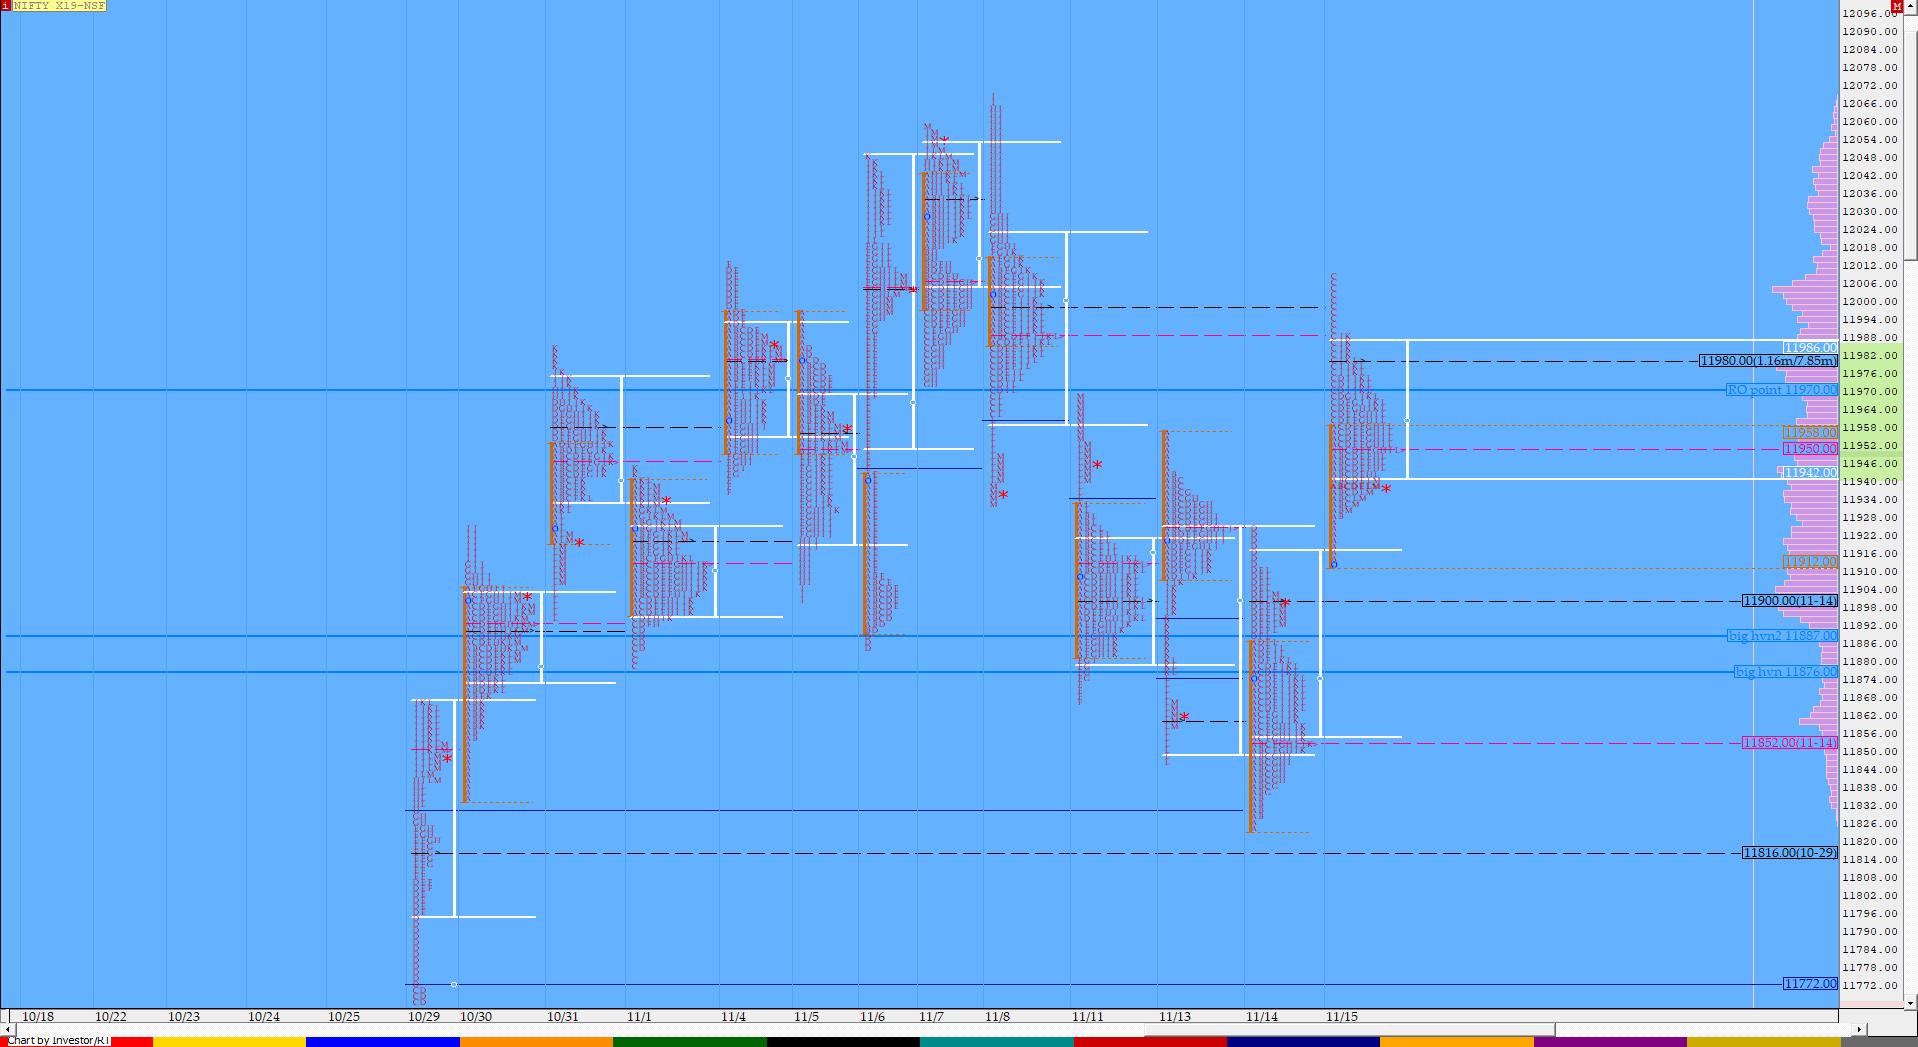 Market Profile Analysis dated 15th November 2